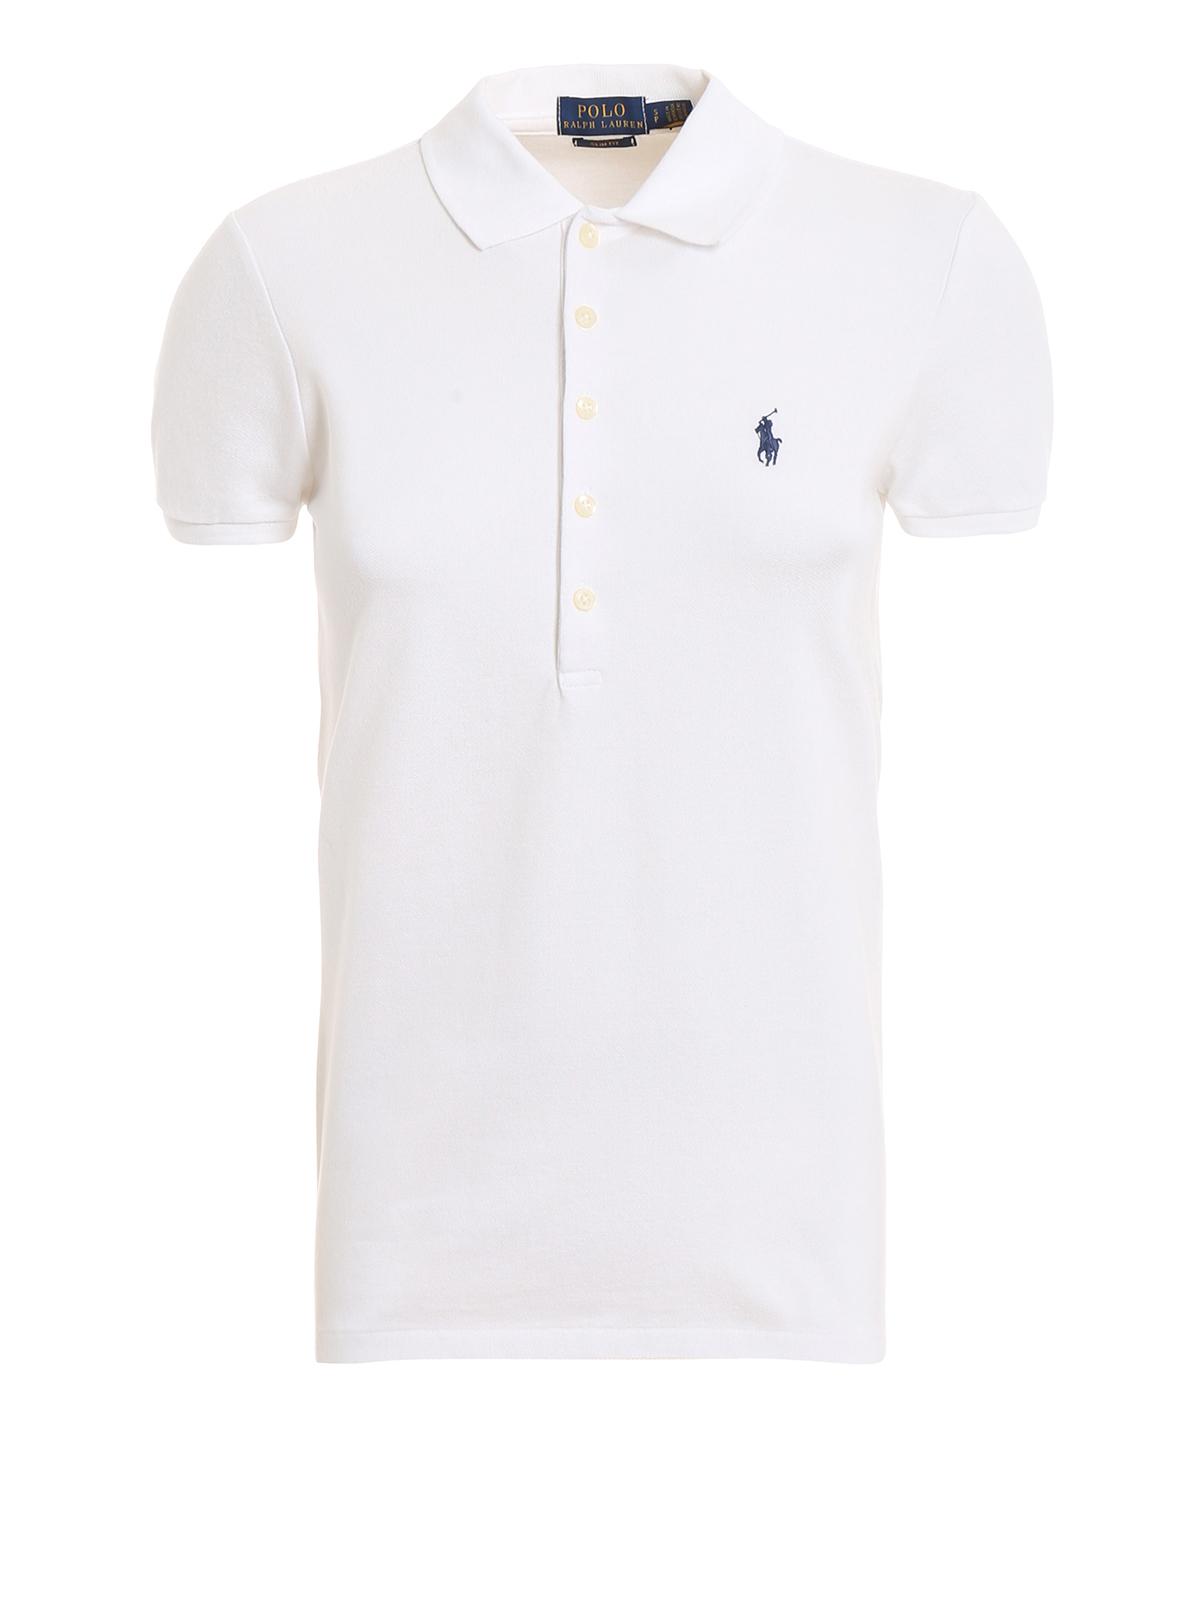 7ef5cd7aa Slim fit white cotton polo shirt - POLO RALPH LAUREN - Paolo Fiorillo